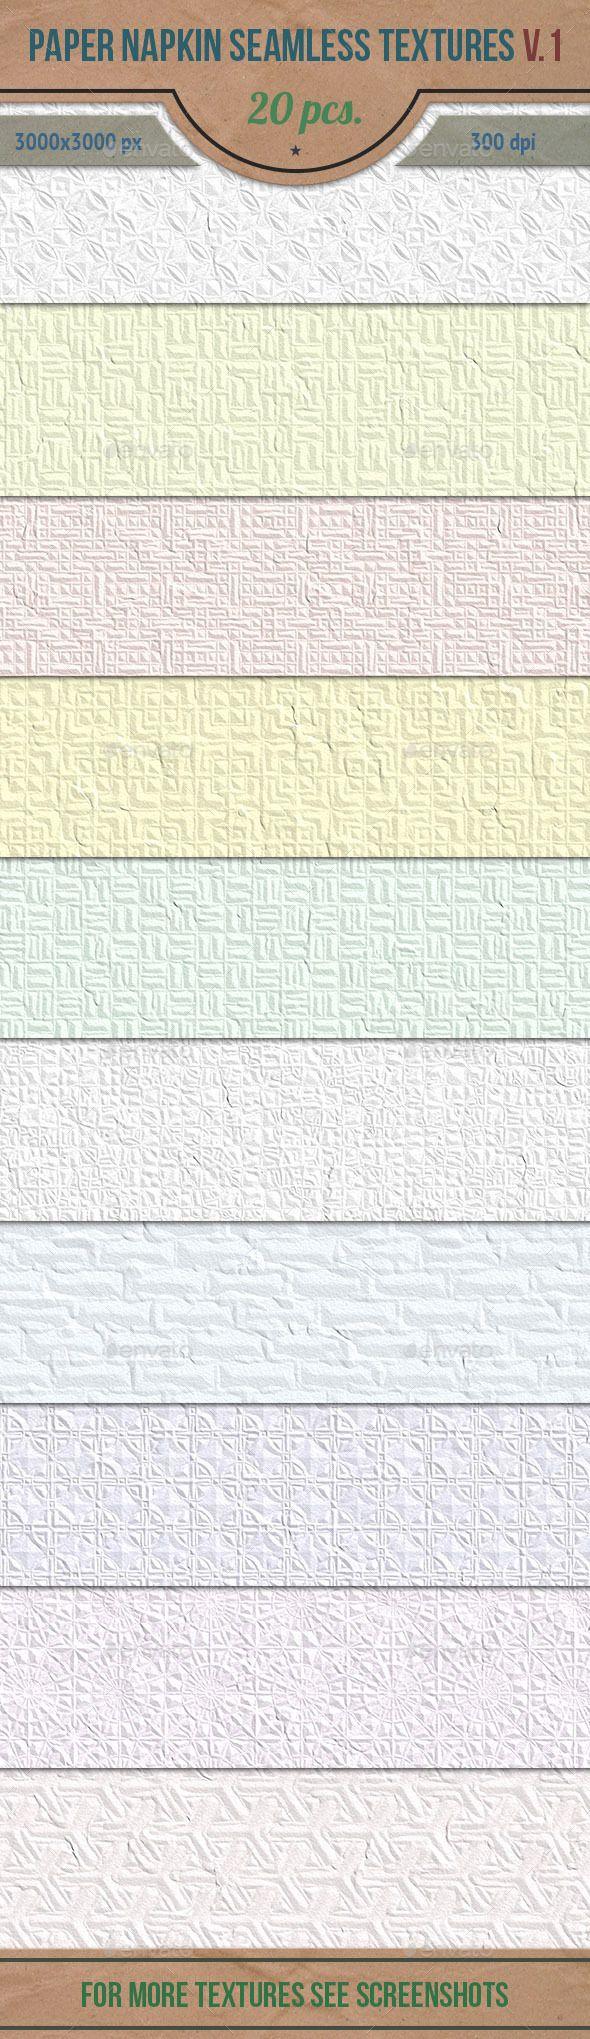 Paper Napkin Seamless HD Textures Set v.1